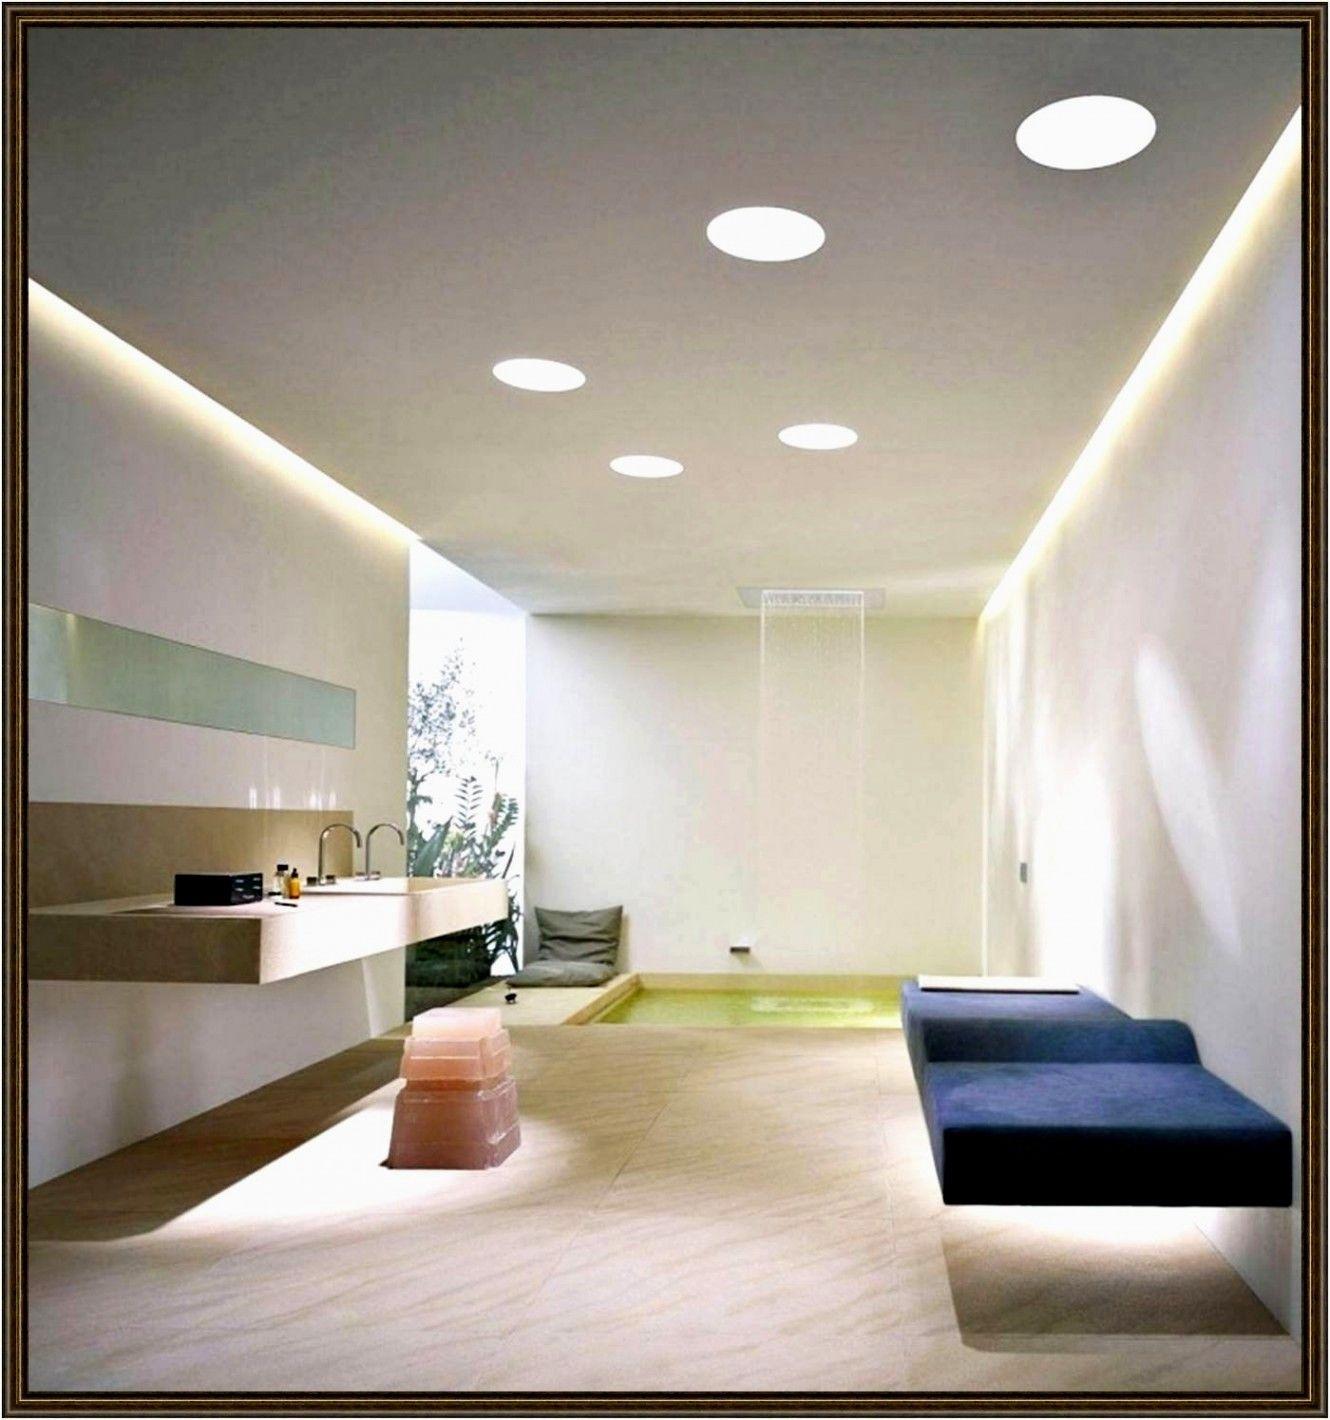 Full Size of Wohnzimmer Led Lampen Einzigartig Landhausstil Sofa Grau Leder Einbauleuchten Bad Beleuchtung Wohnwand Anbauwand Lampe Deckenlampen Für Vorhänge Kunstleder Wohnzimmer Wohnzimmer Led